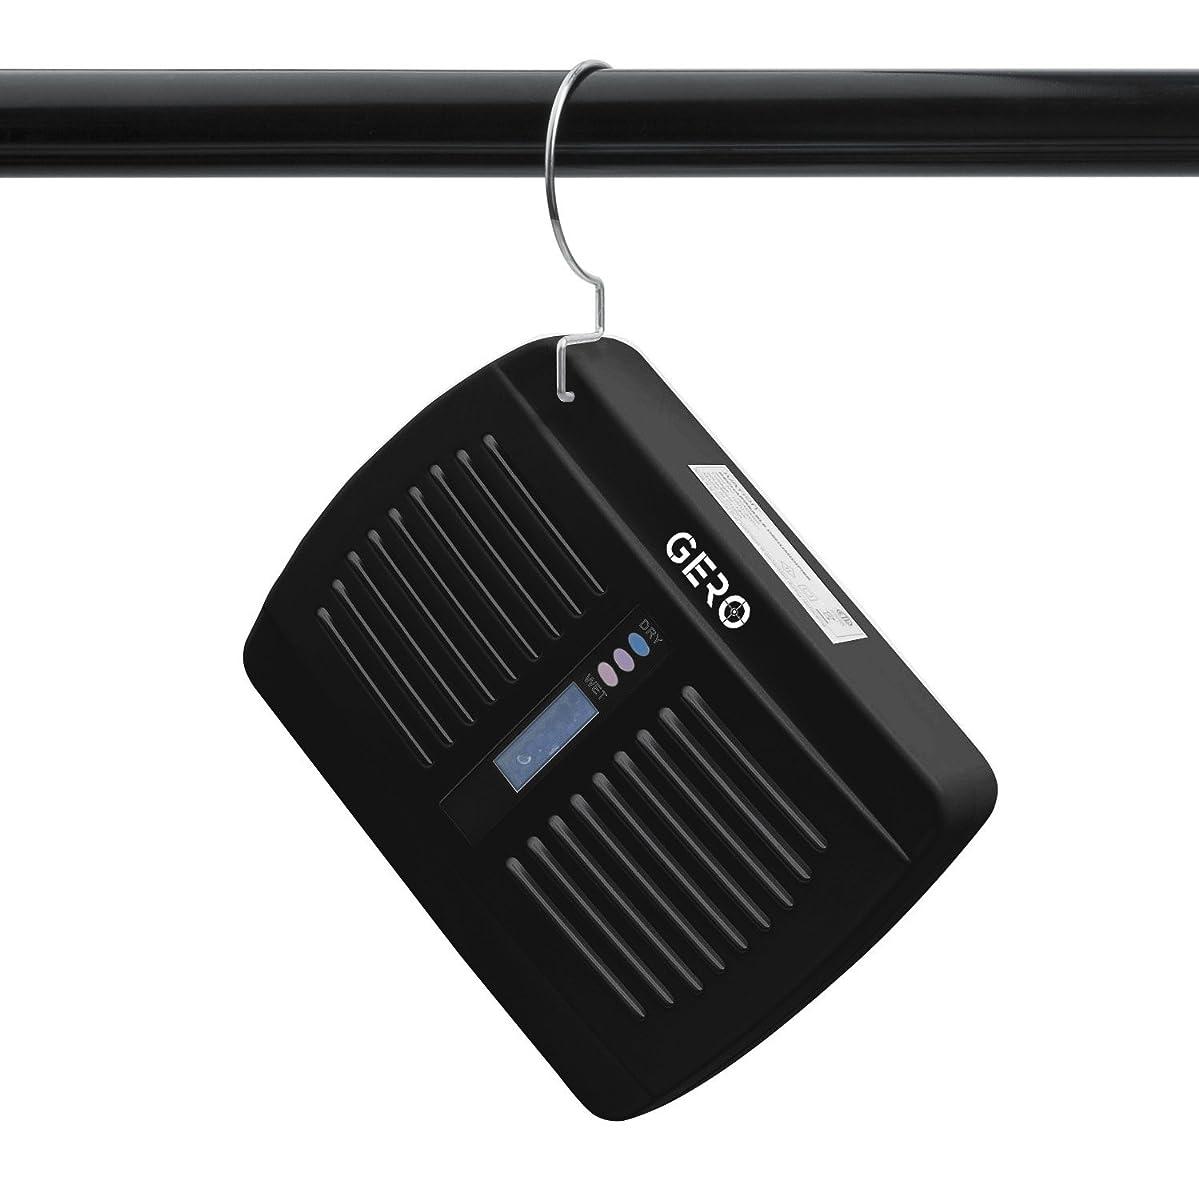 Black Mini Dehumidifier By Gero Rechargeable Renewable